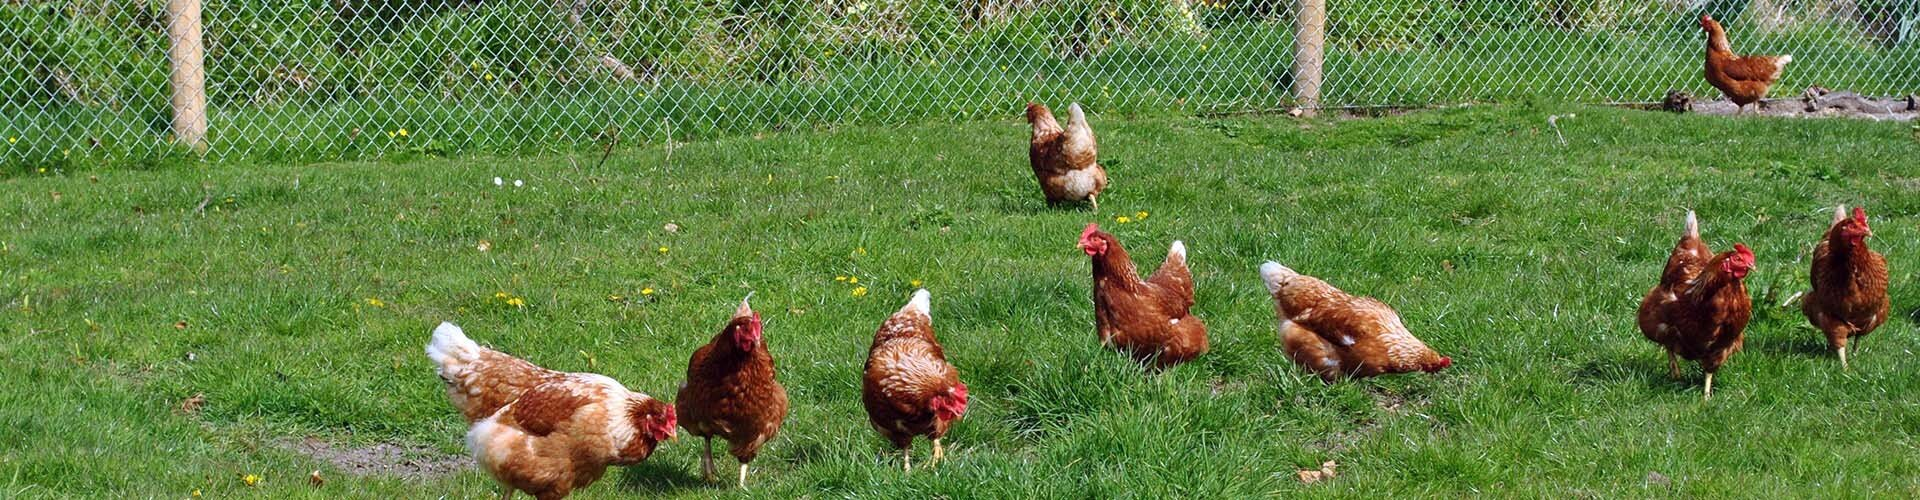 Farmyard hens at Killiane Castle